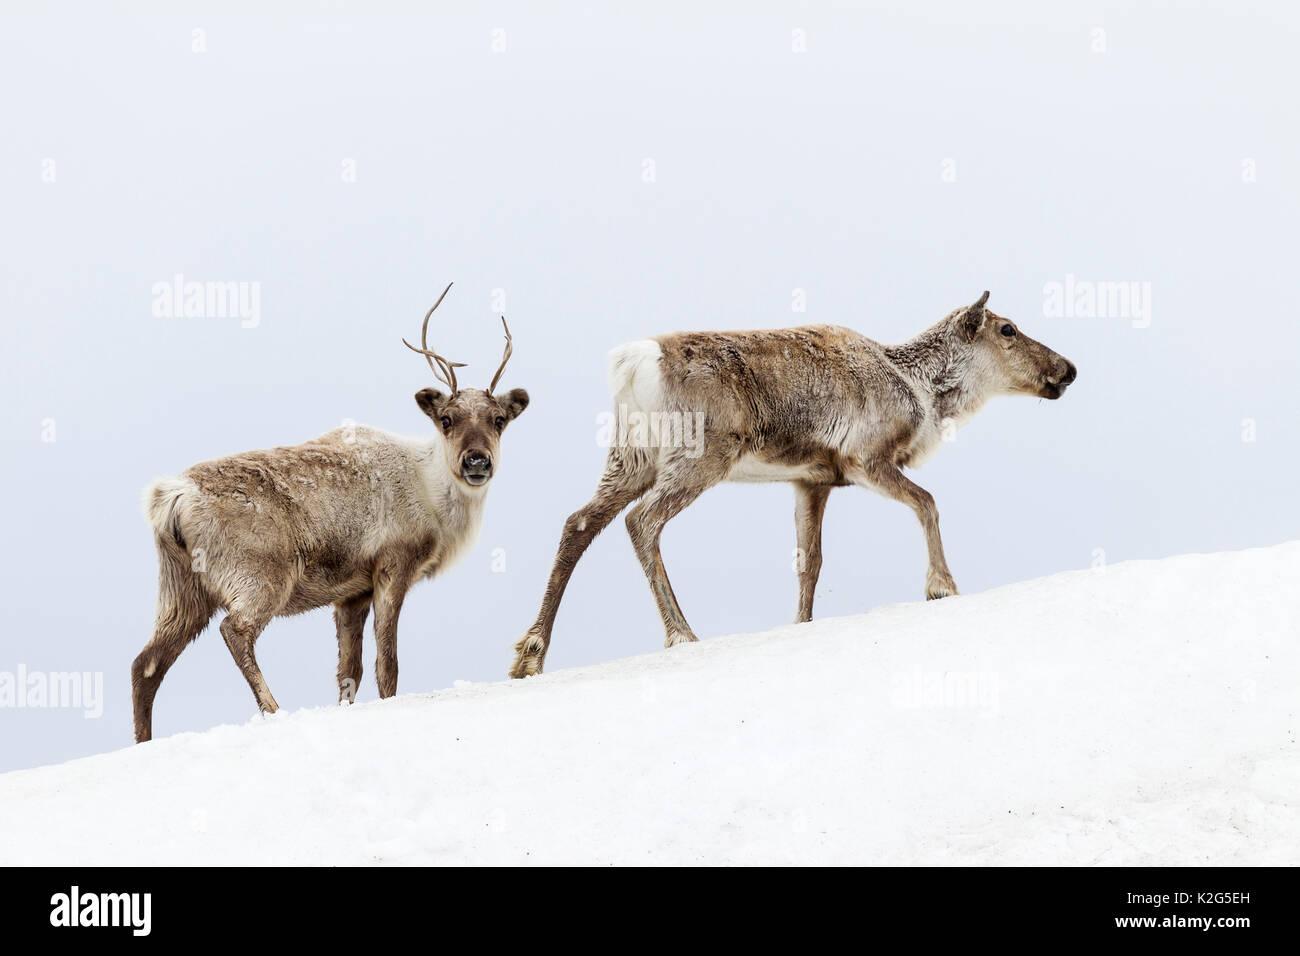 Reindeer (Rangifer tarandus),  two females in snowdrift - Stock Image